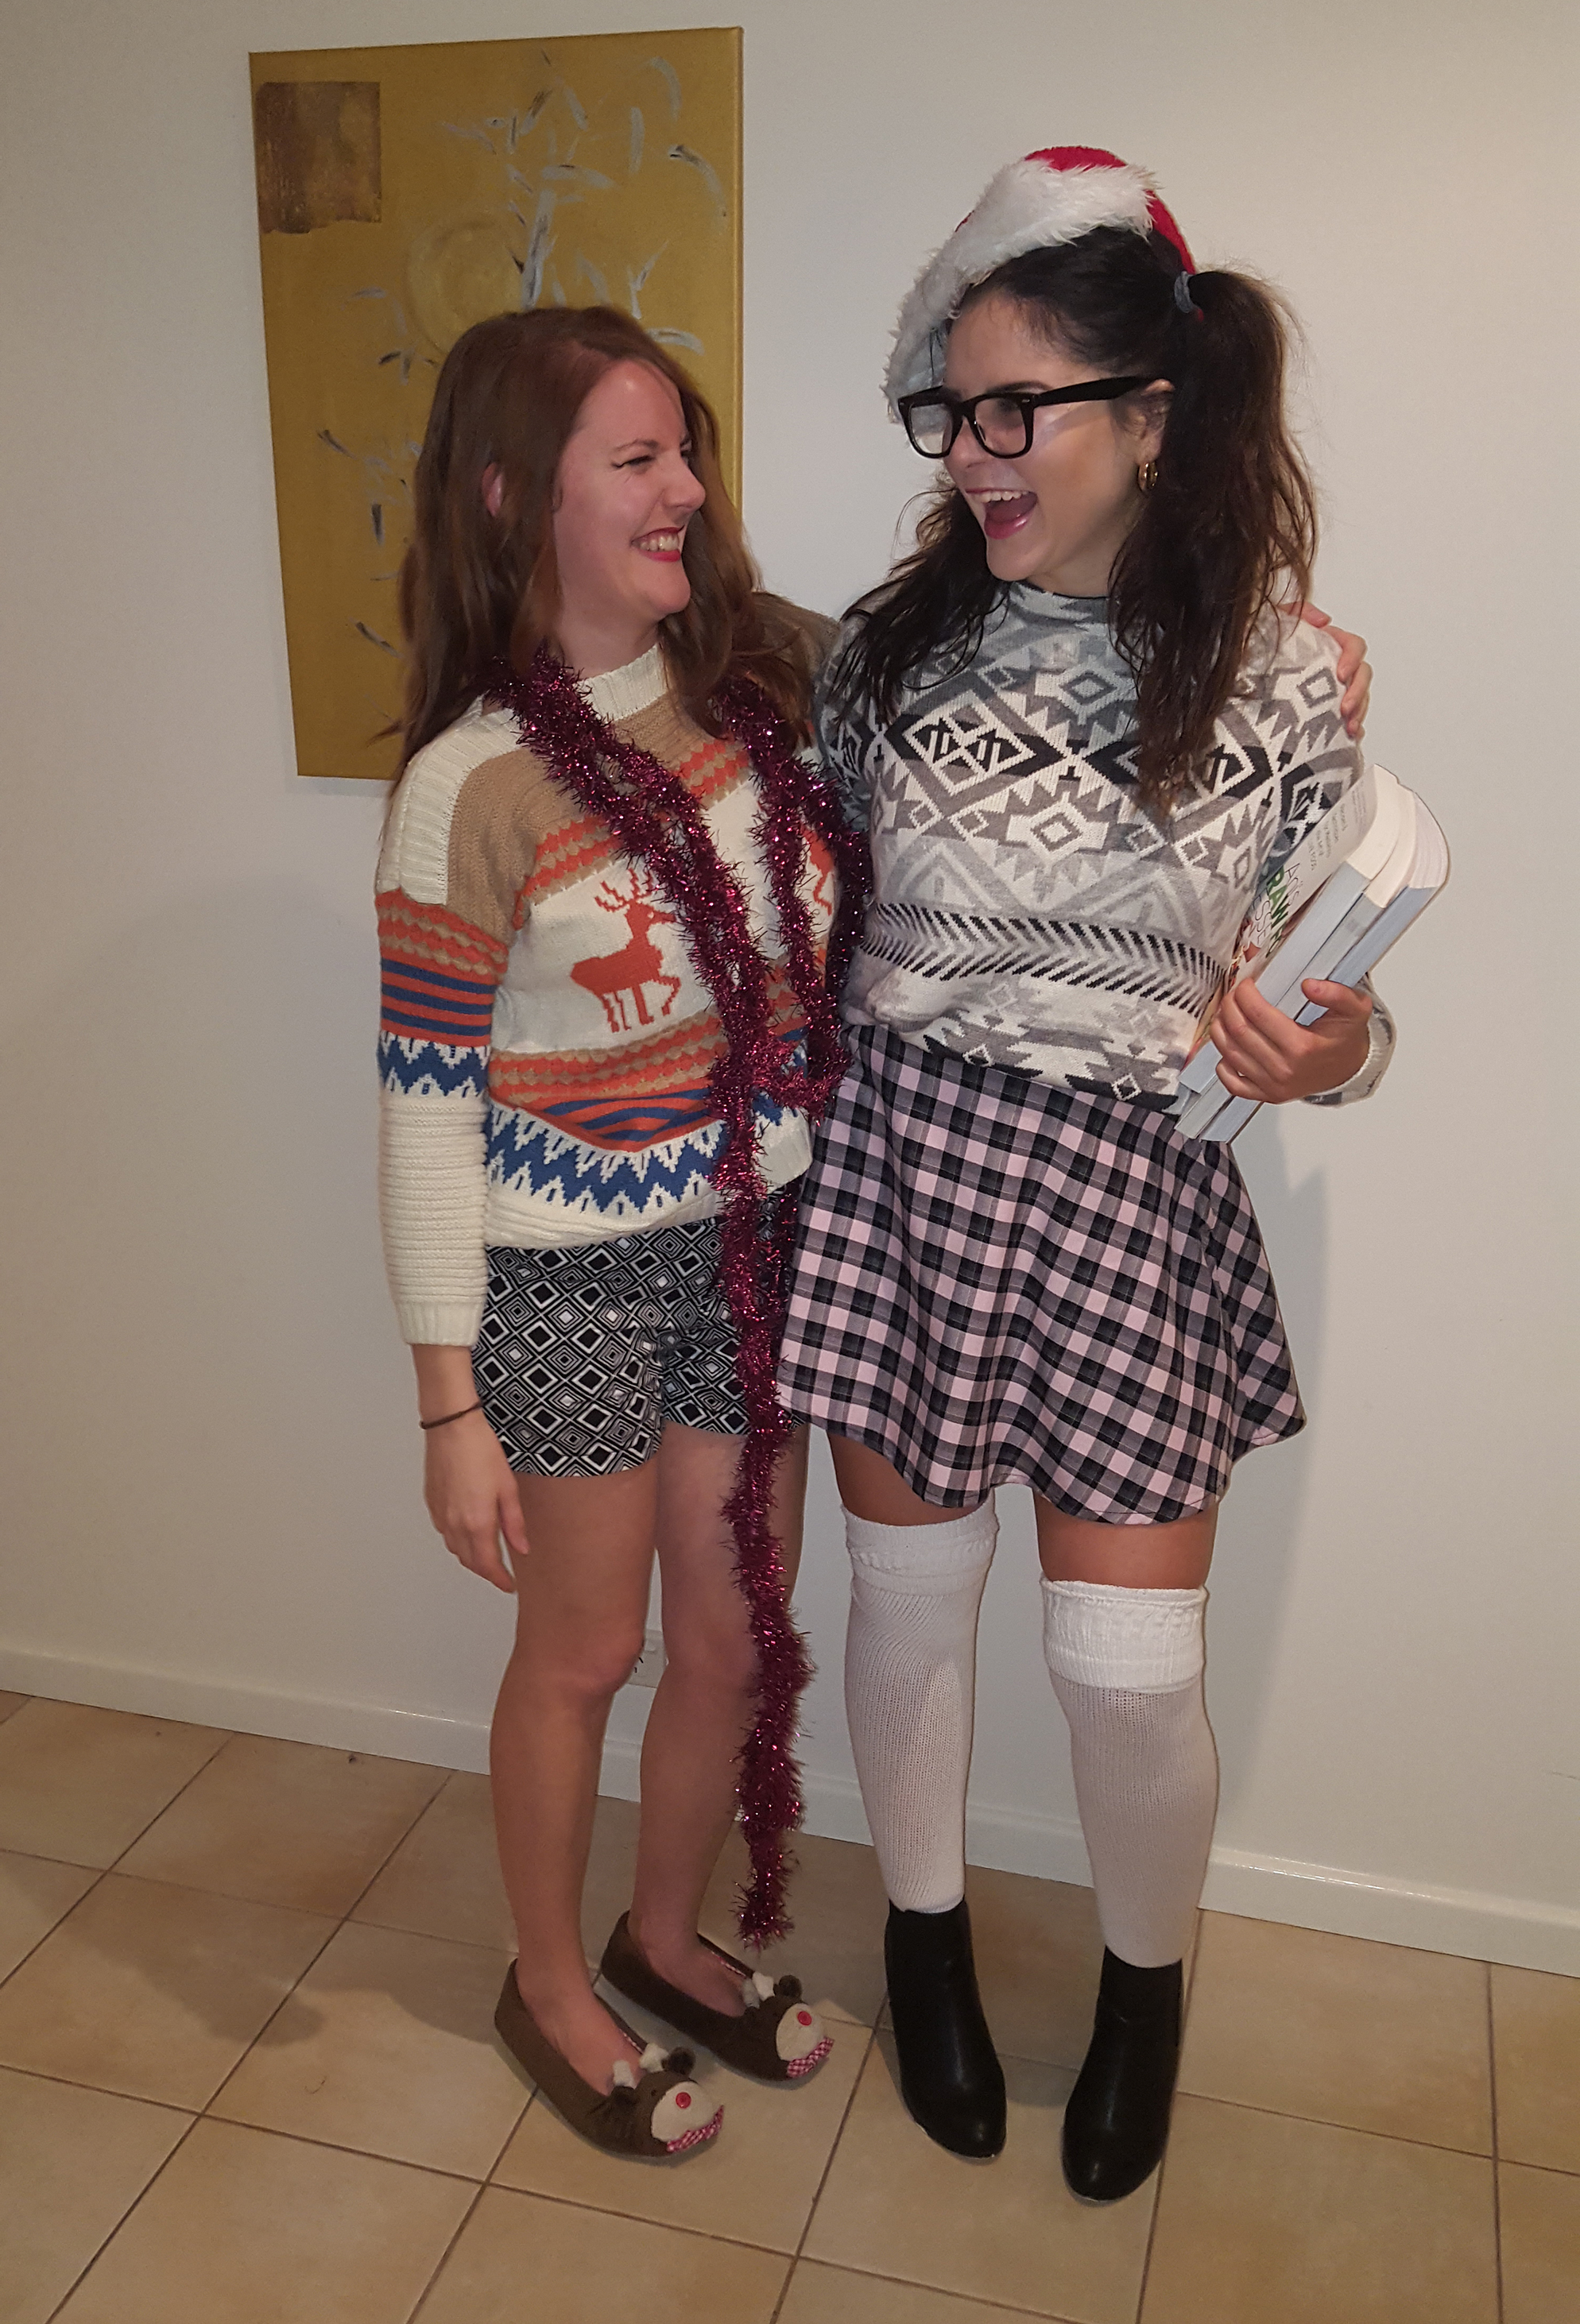 Nerd Girl Fashion: Geek Chic Style   Perth Girl